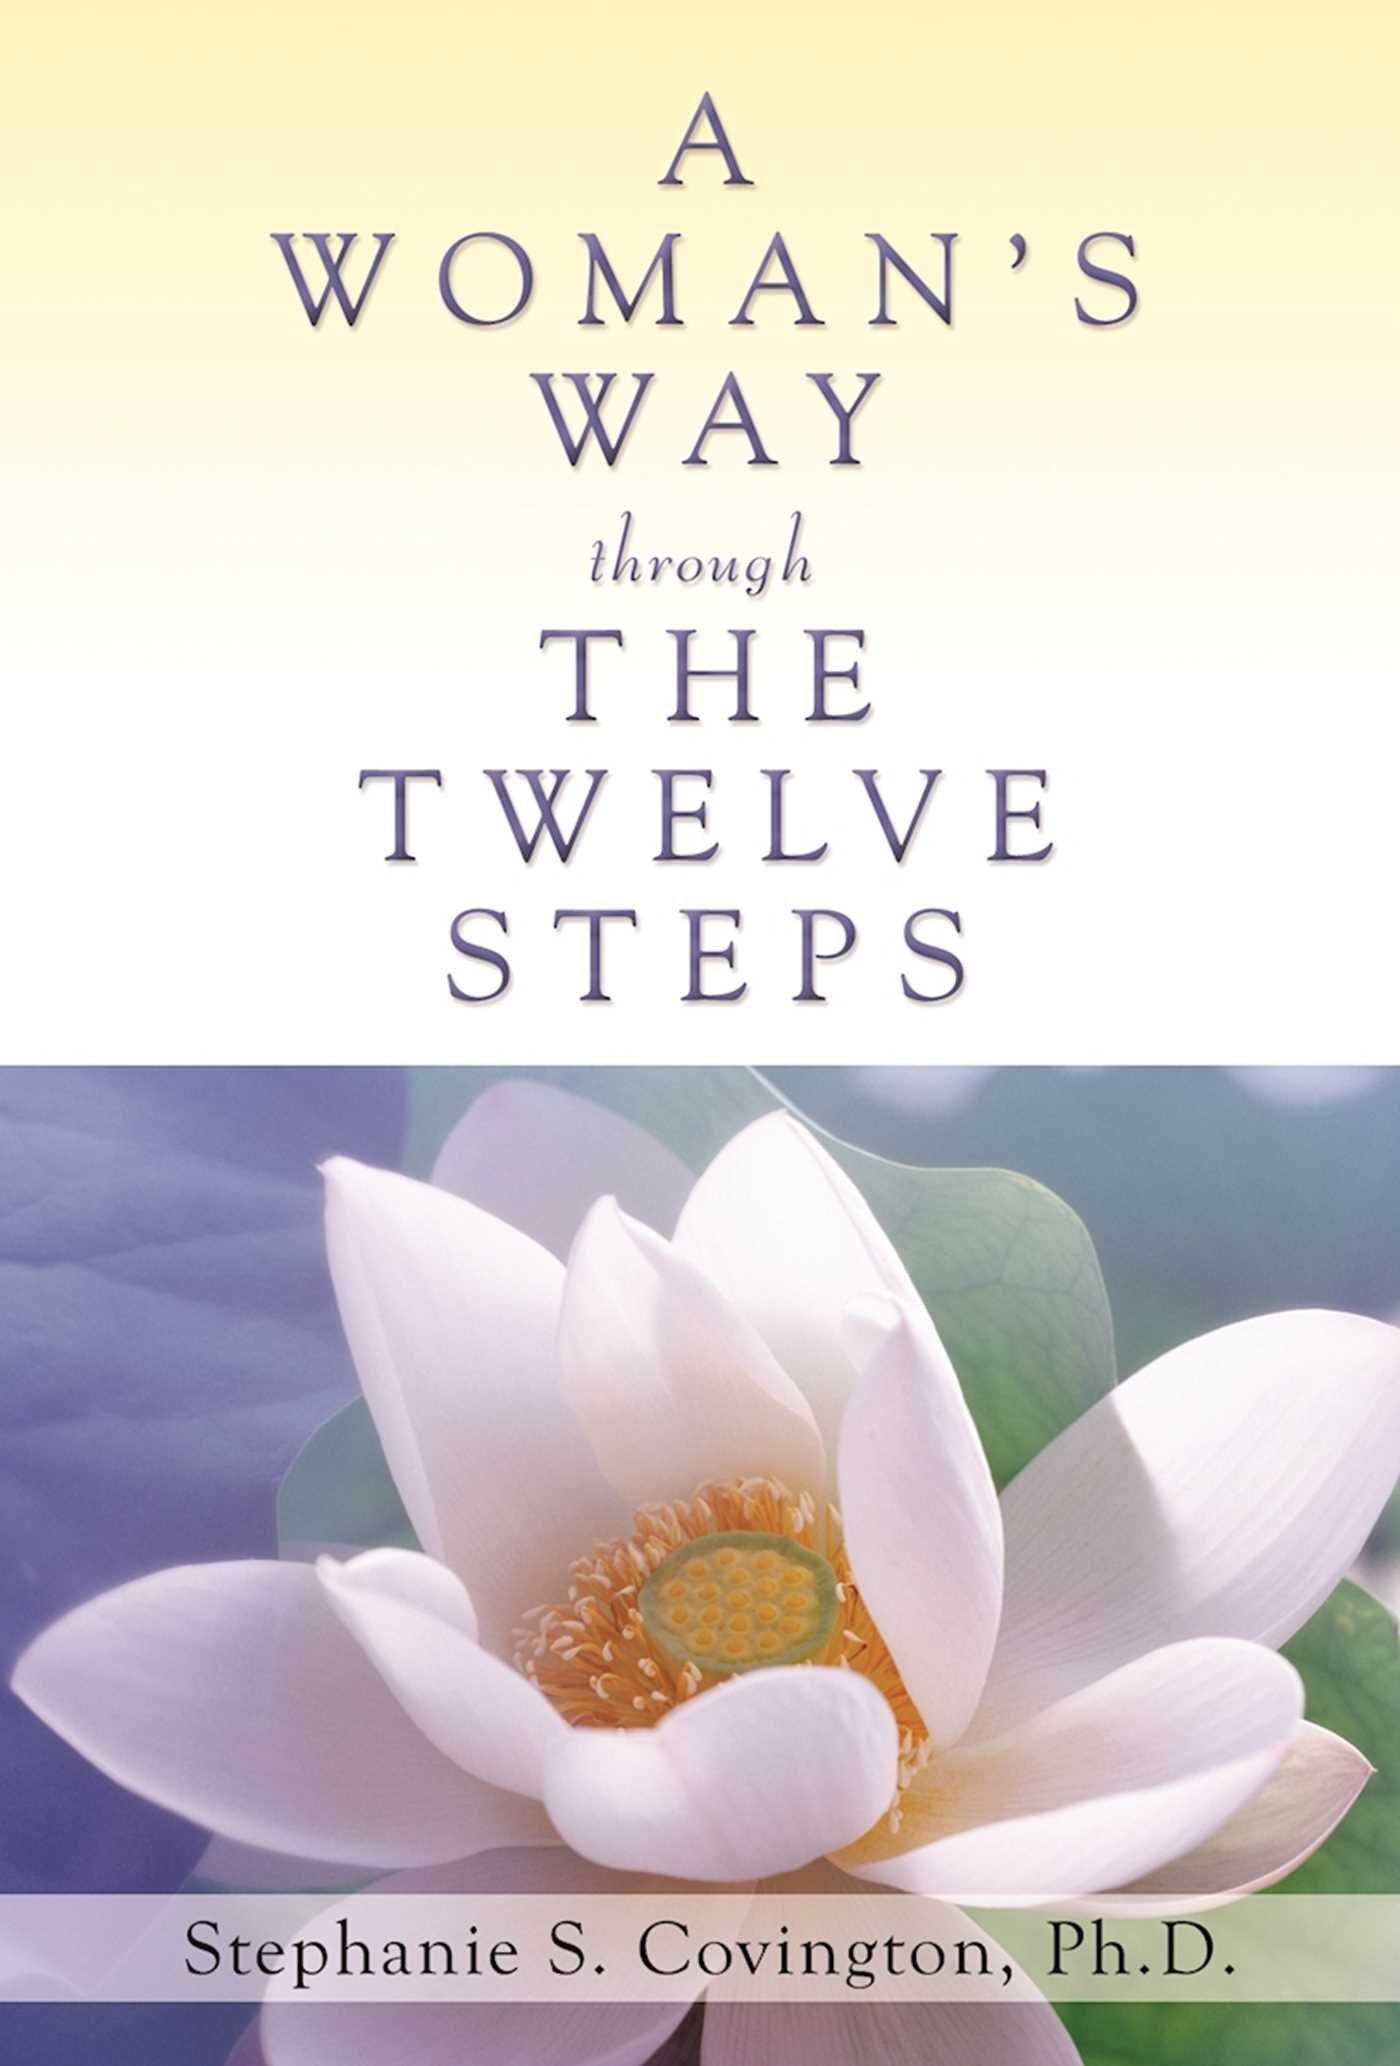 A womans way through the twelve steps stephanie s covington a womans way through the twelve steps stephanie s covington 9780894869938 amazon books izmirmasajfo